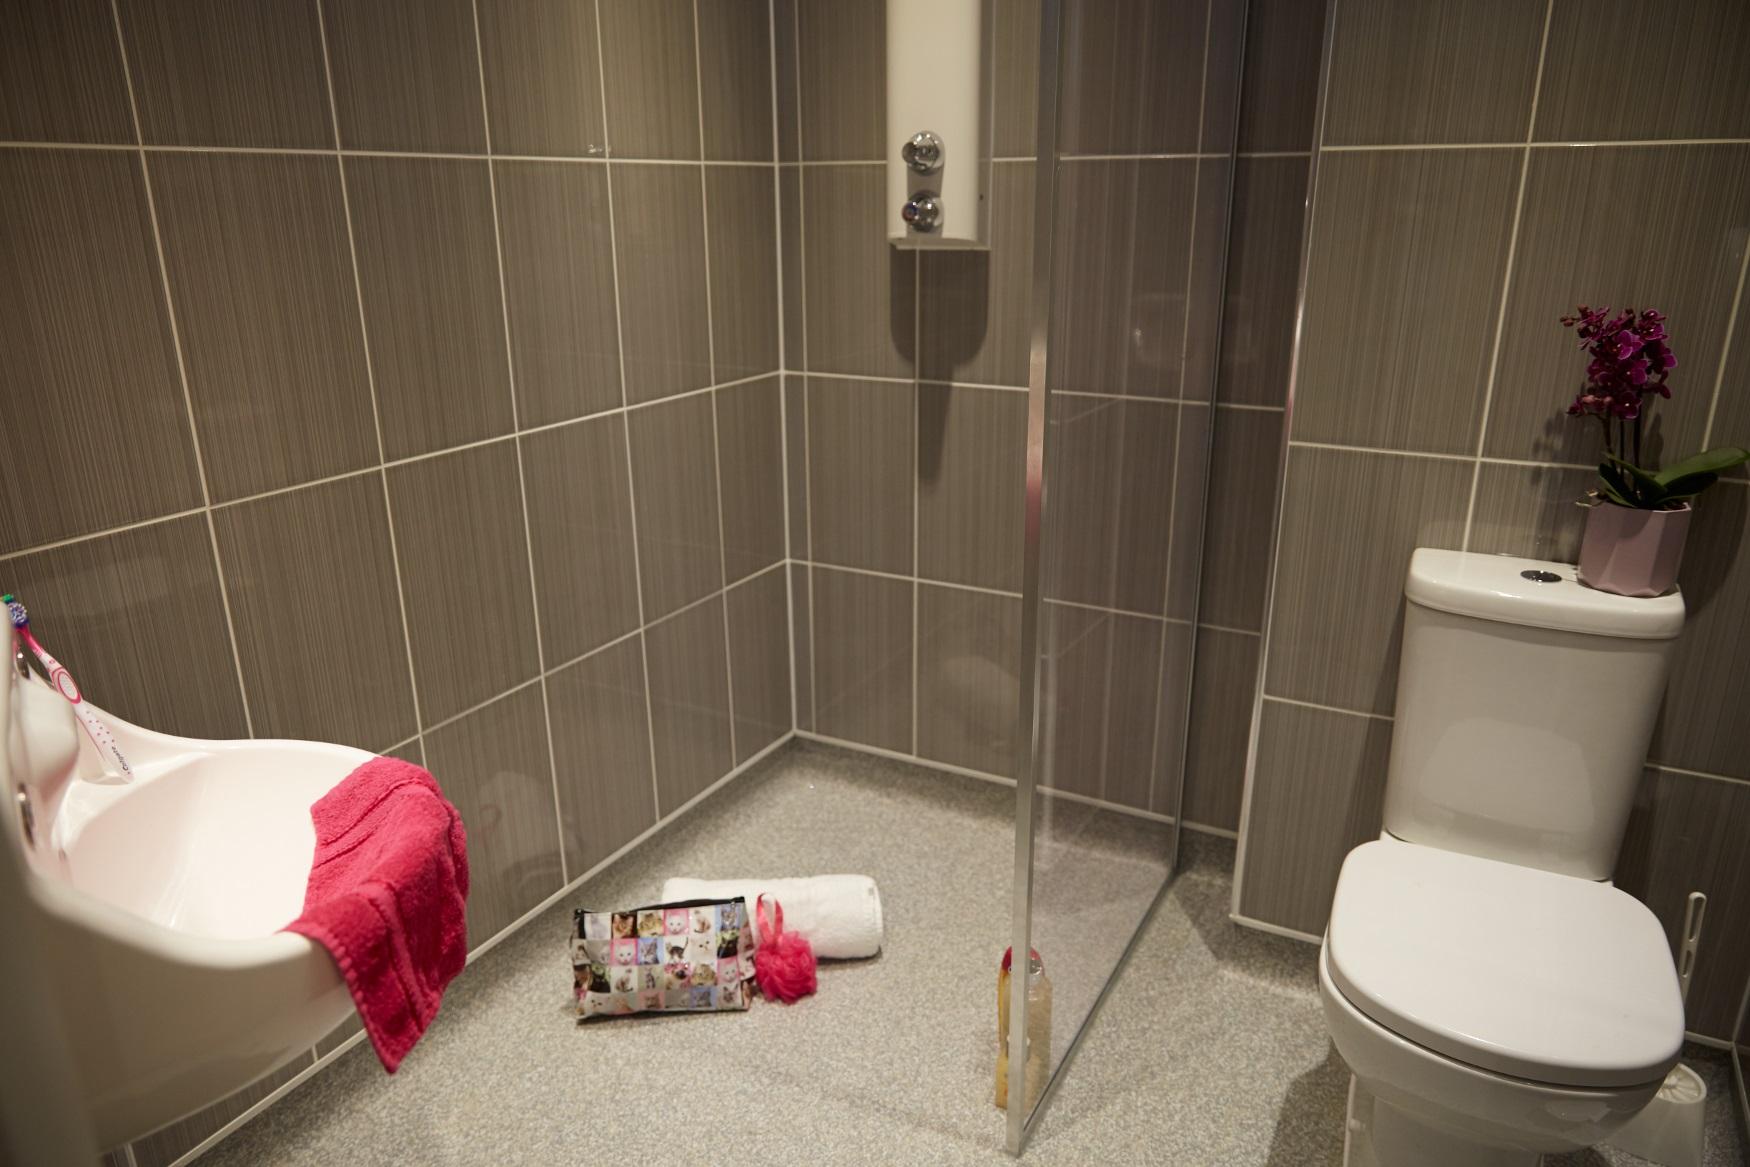 Private Adolescent Mental Health Unit bathroom